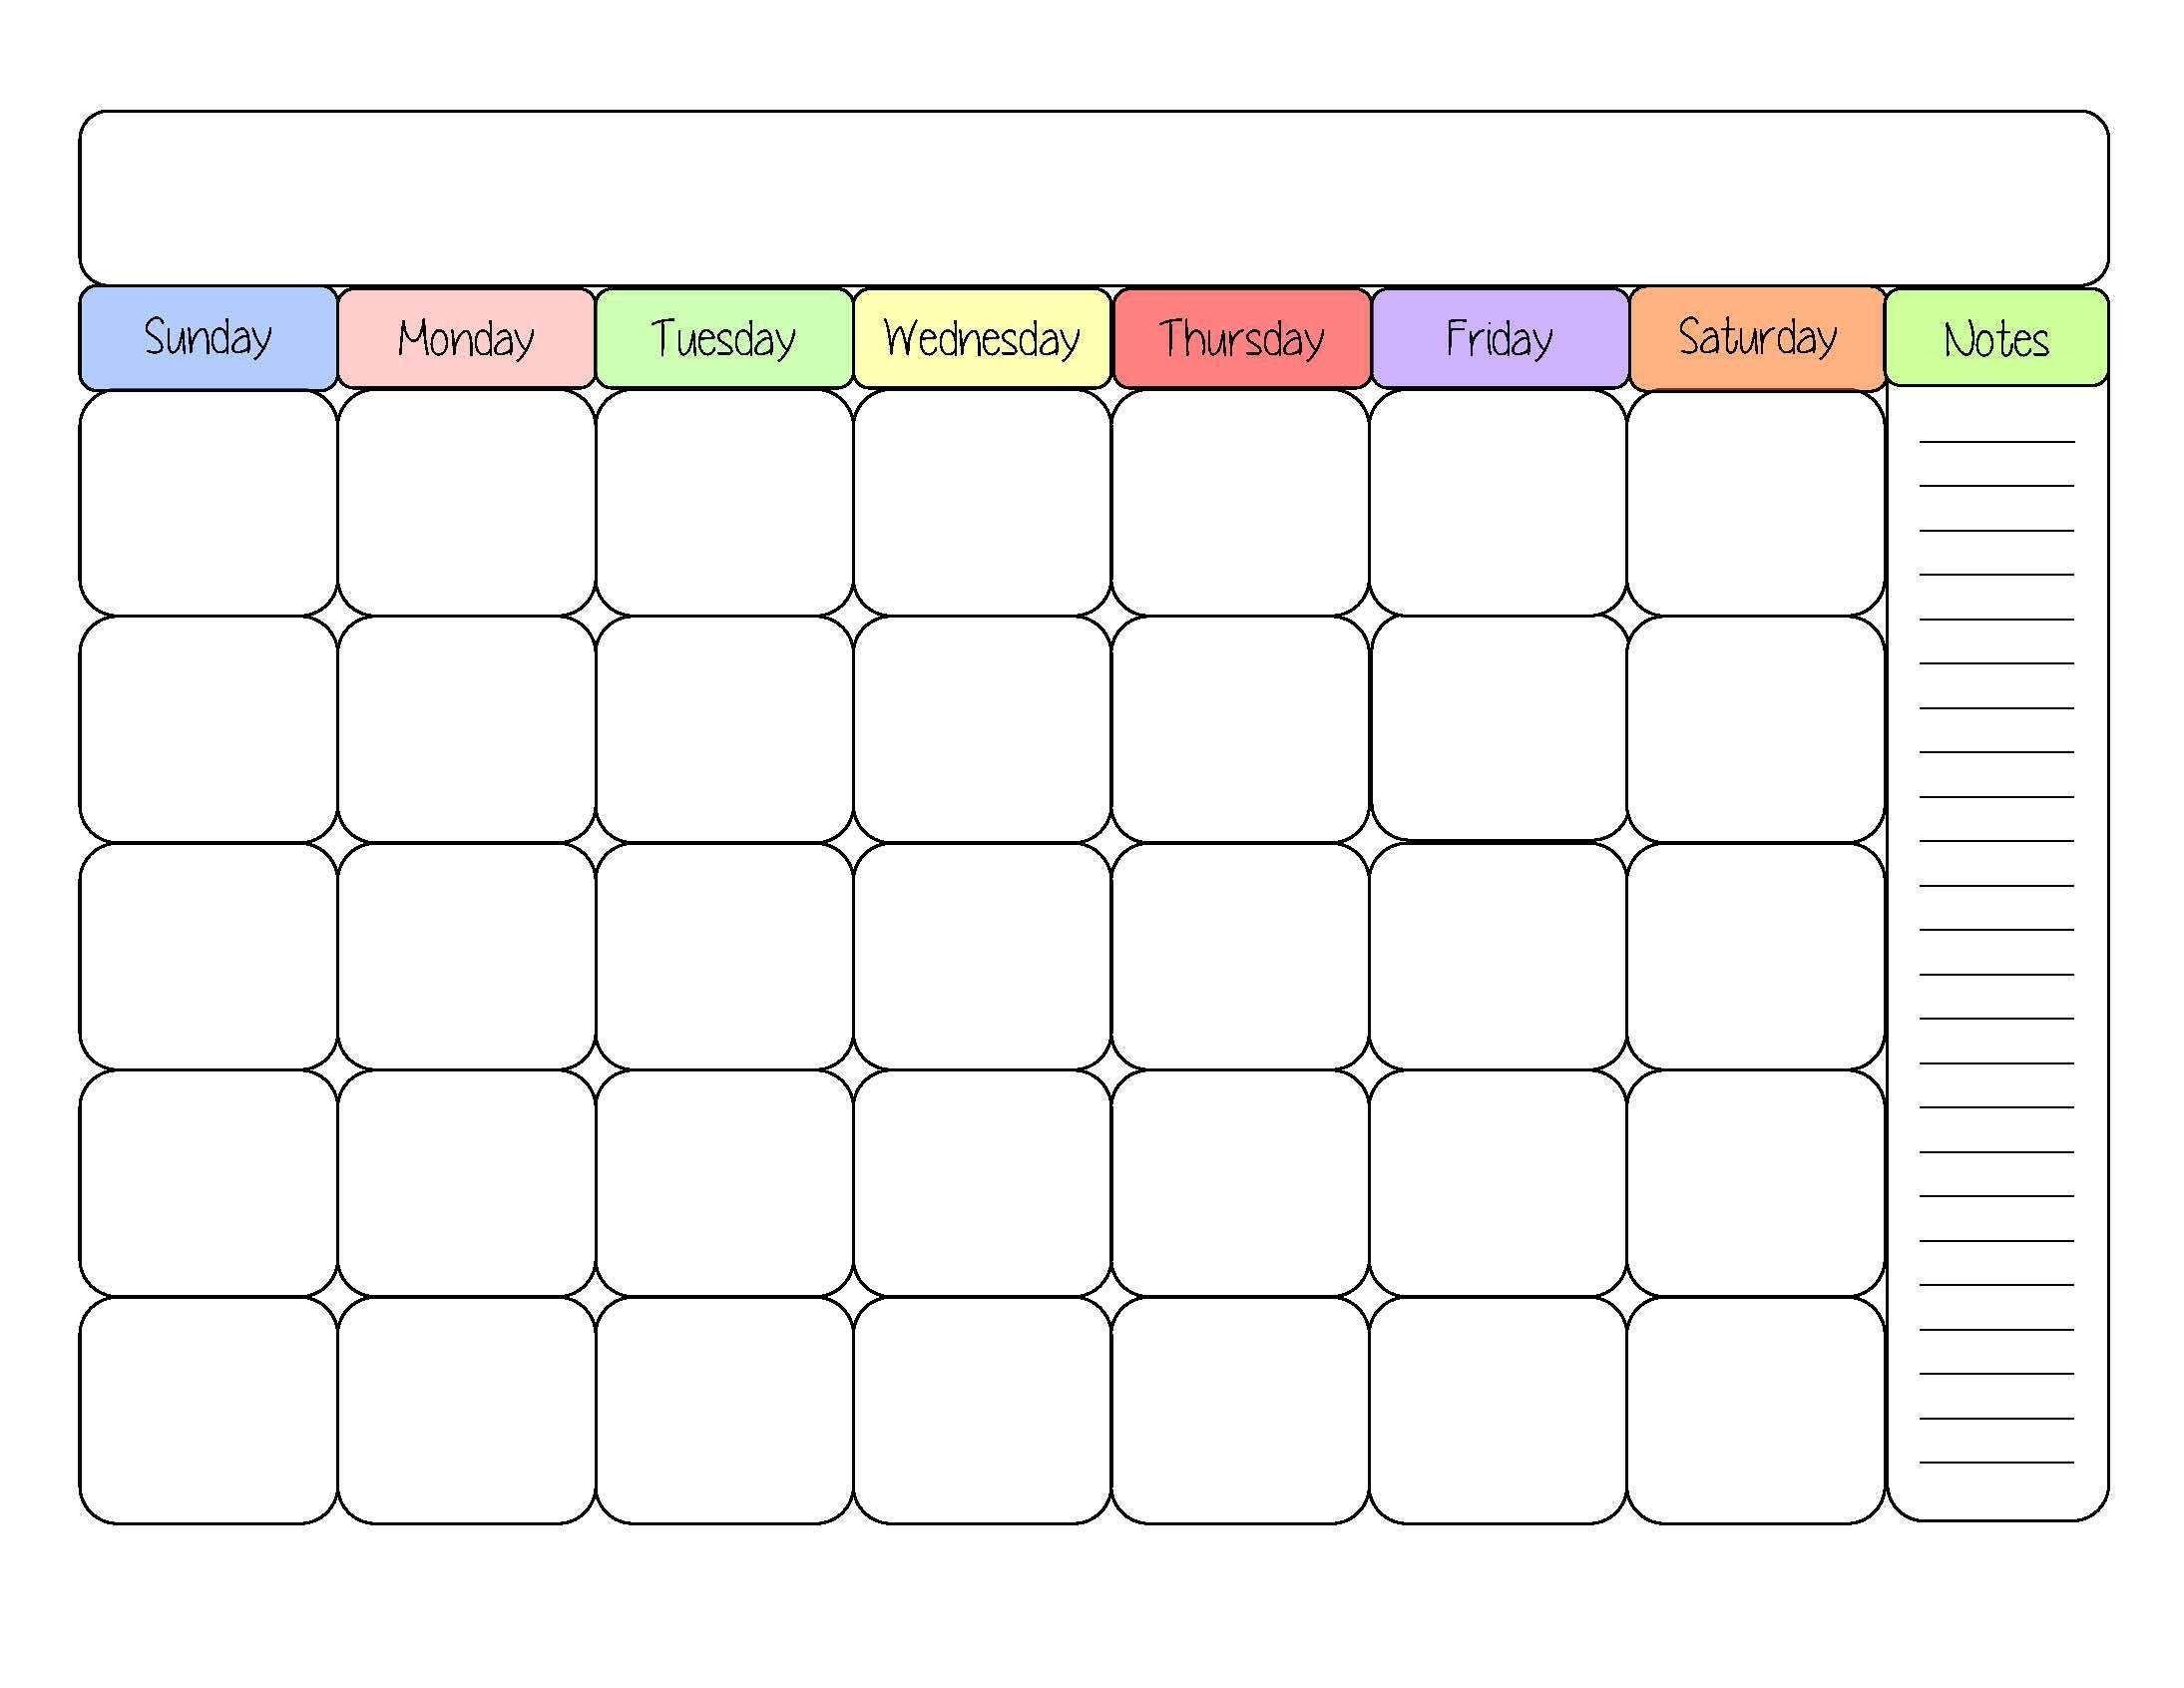 December 2018 Blank Calendar Monthly Planner